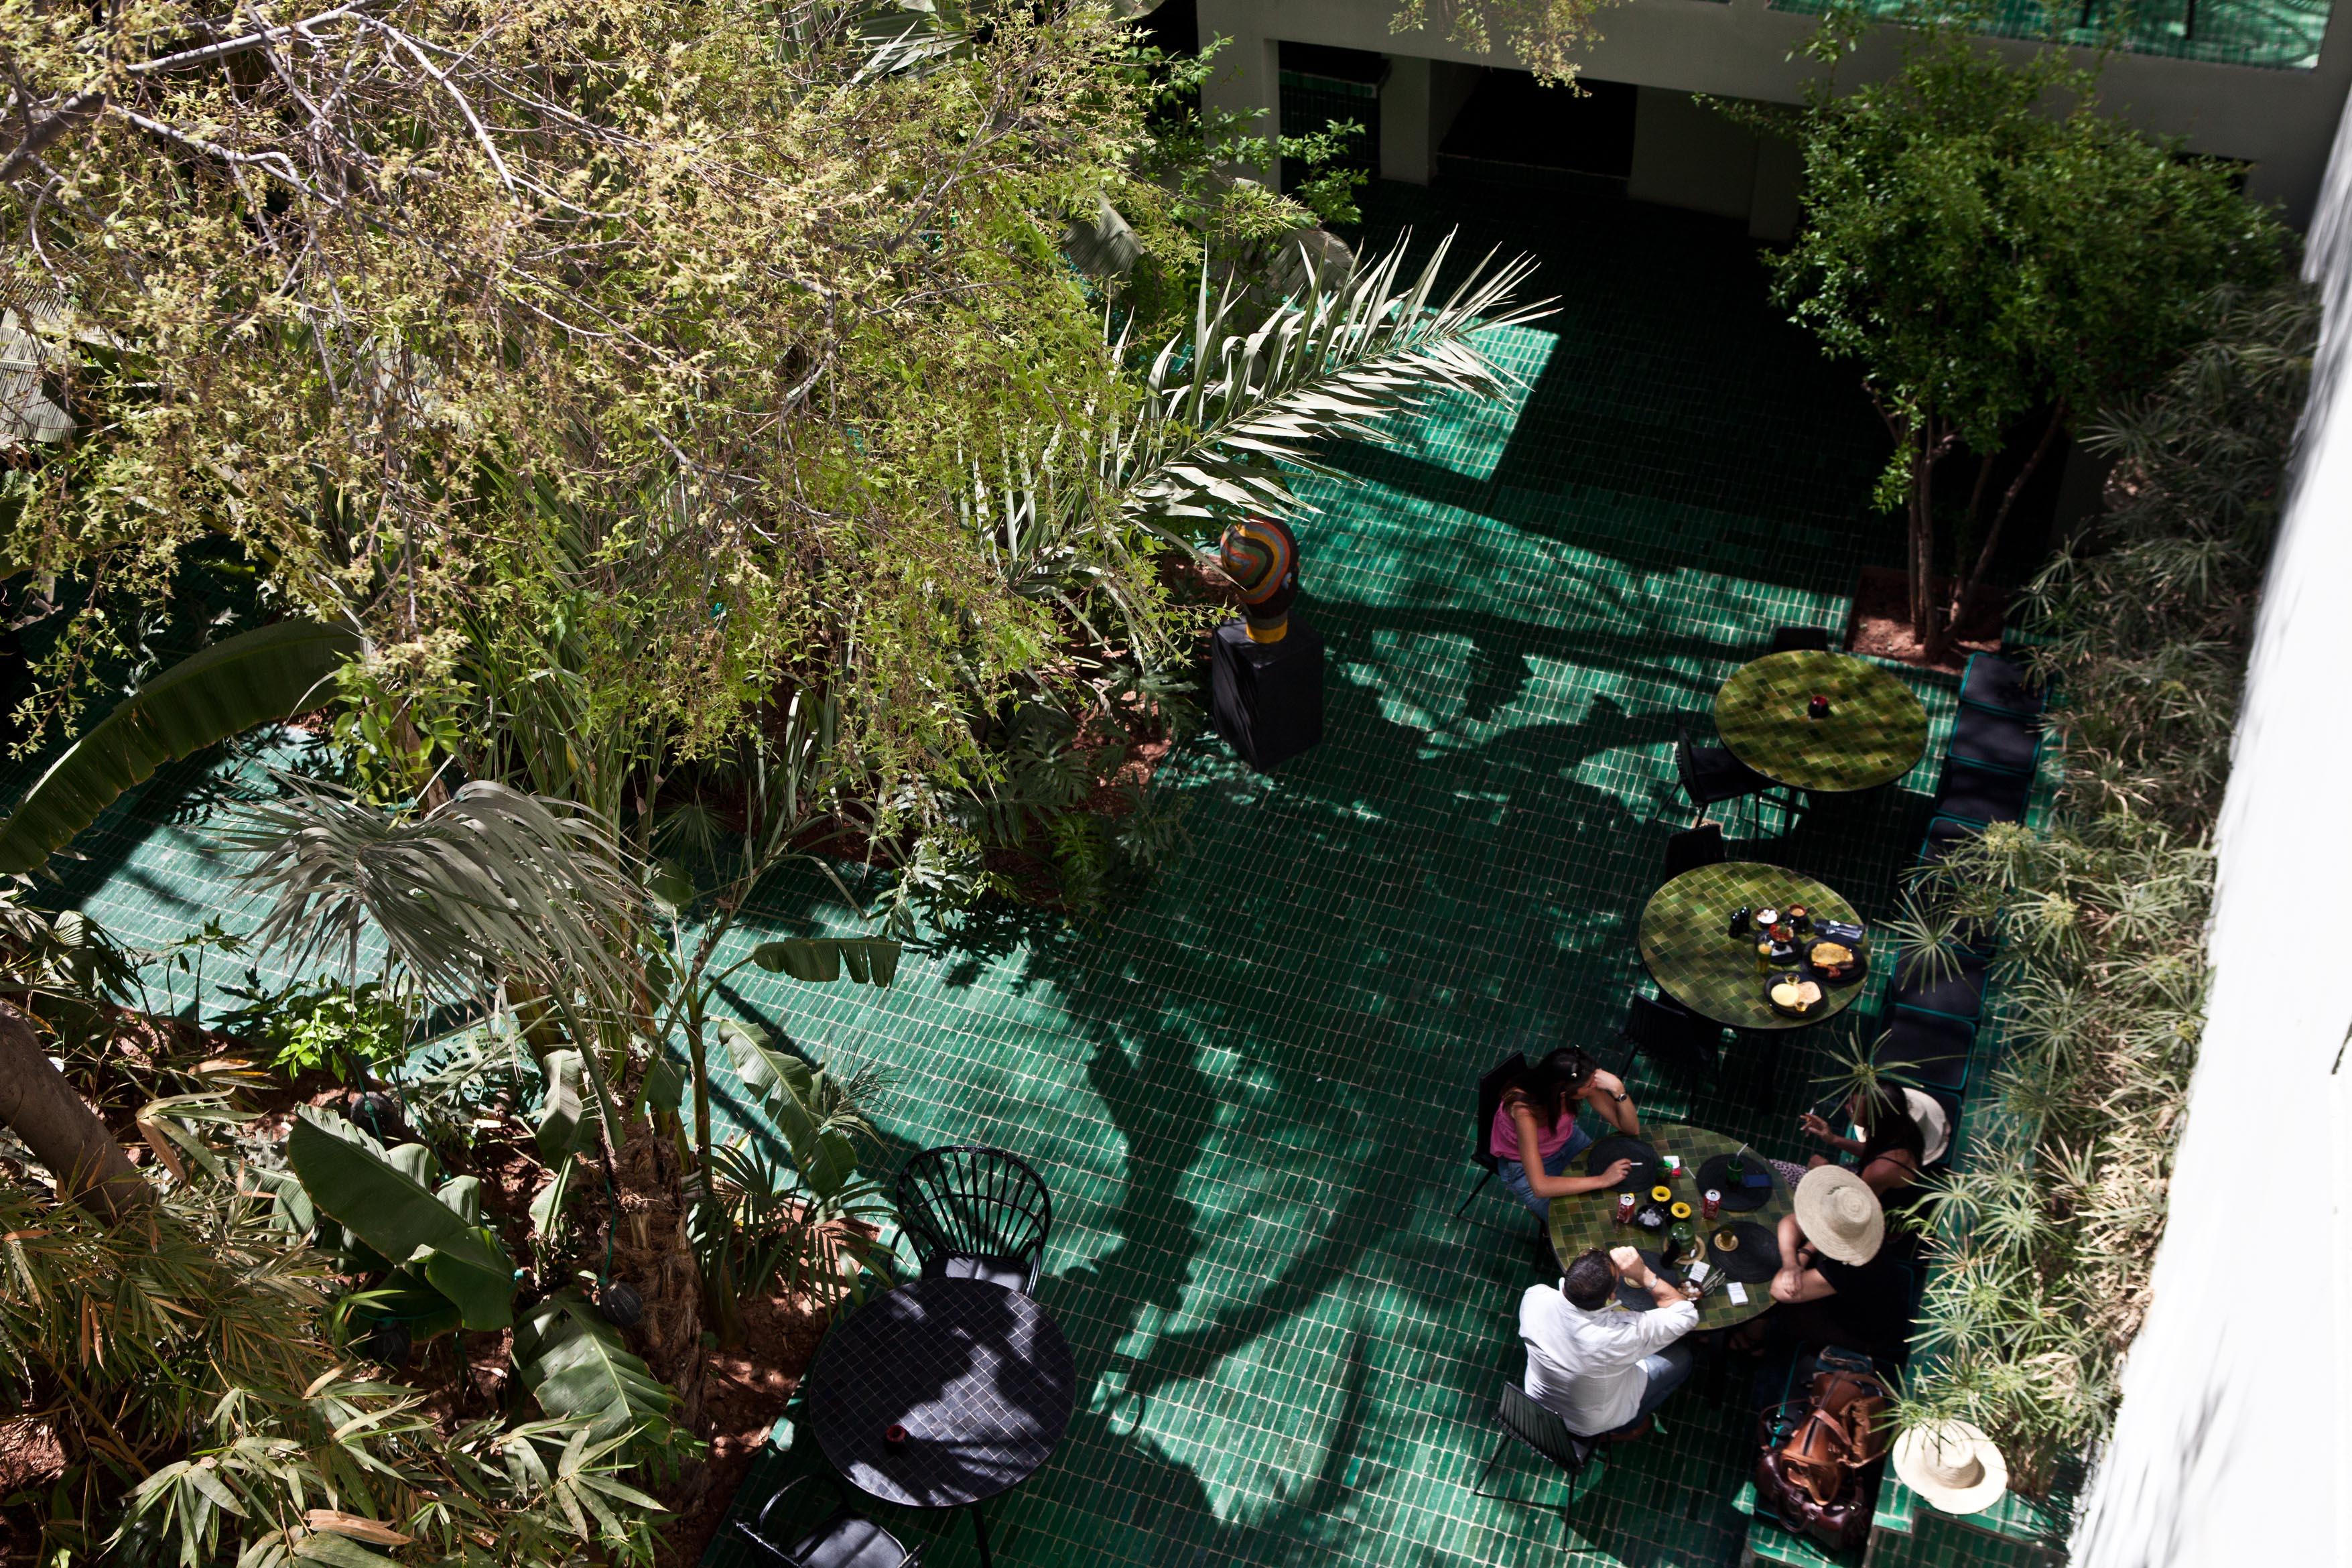 Marrakech ii d nde comer la chica de la ciudad for Le jardin 32 route sidi abdelaziz marrakech 40000